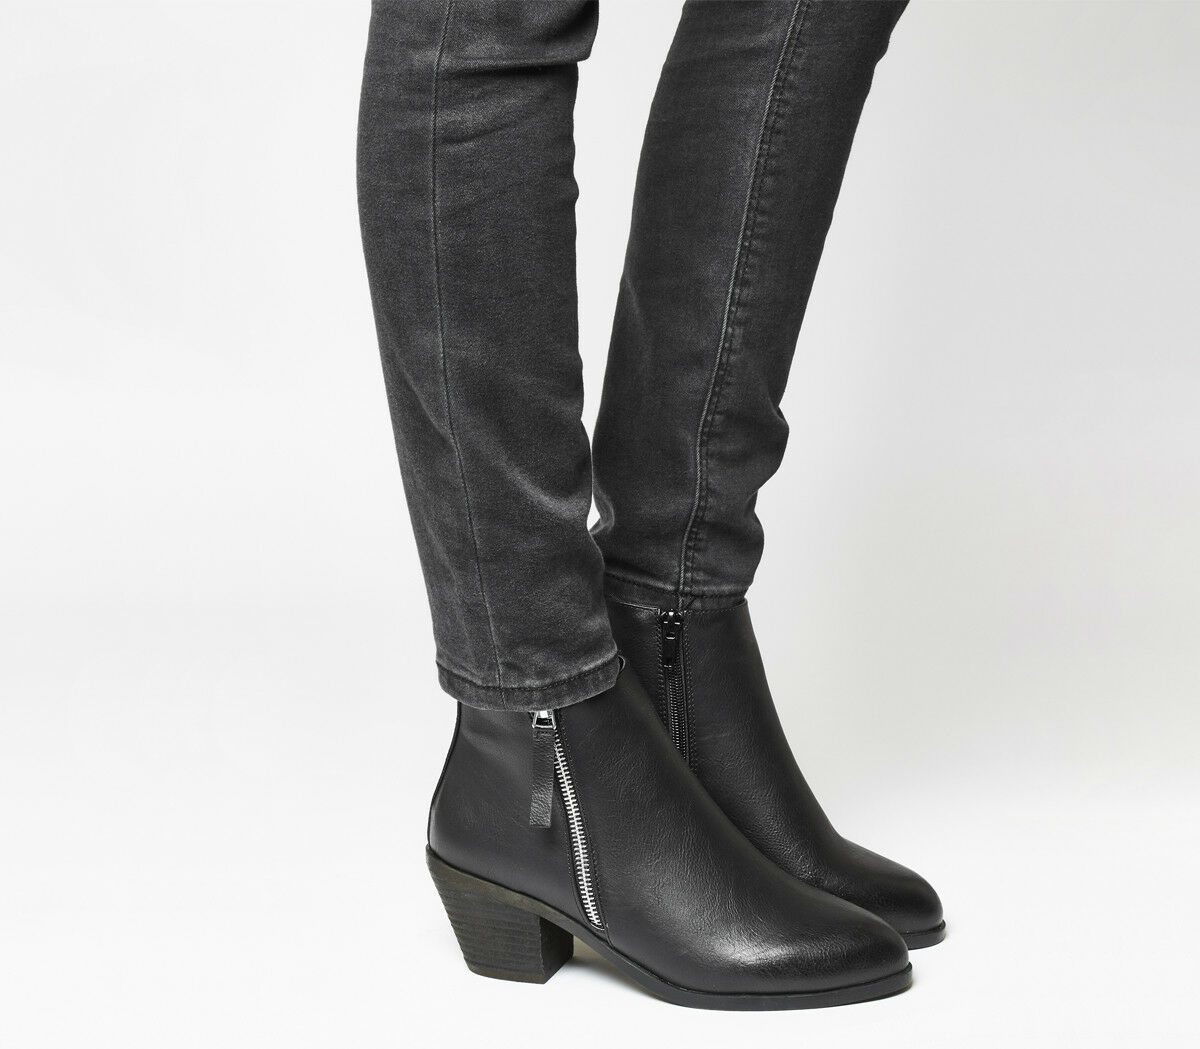 Para Mujer Oficina Anita Cremallera Lateral botas Negras Negras Negras botas Media Occidental  apresurado a ver